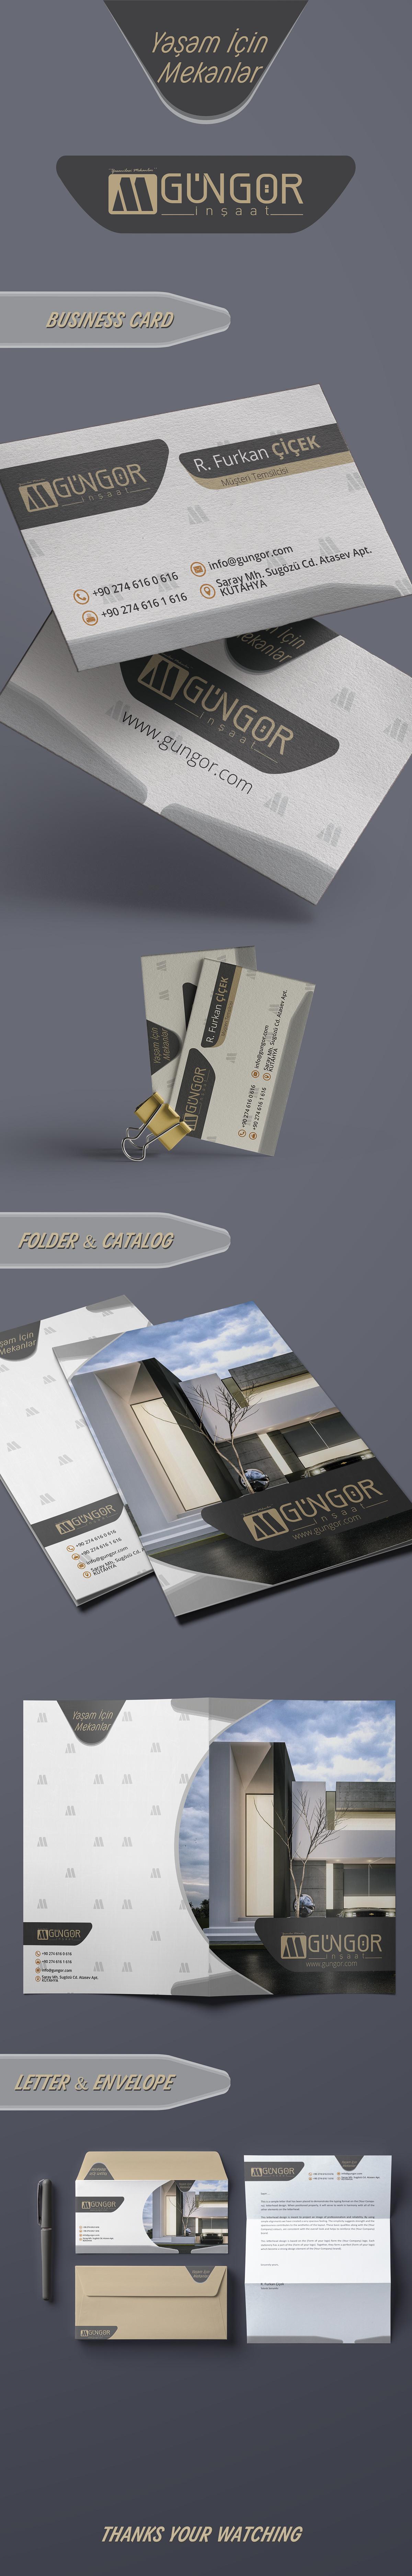 Gungor Construction Brand Identity Free Mockup on Pantone Canvas